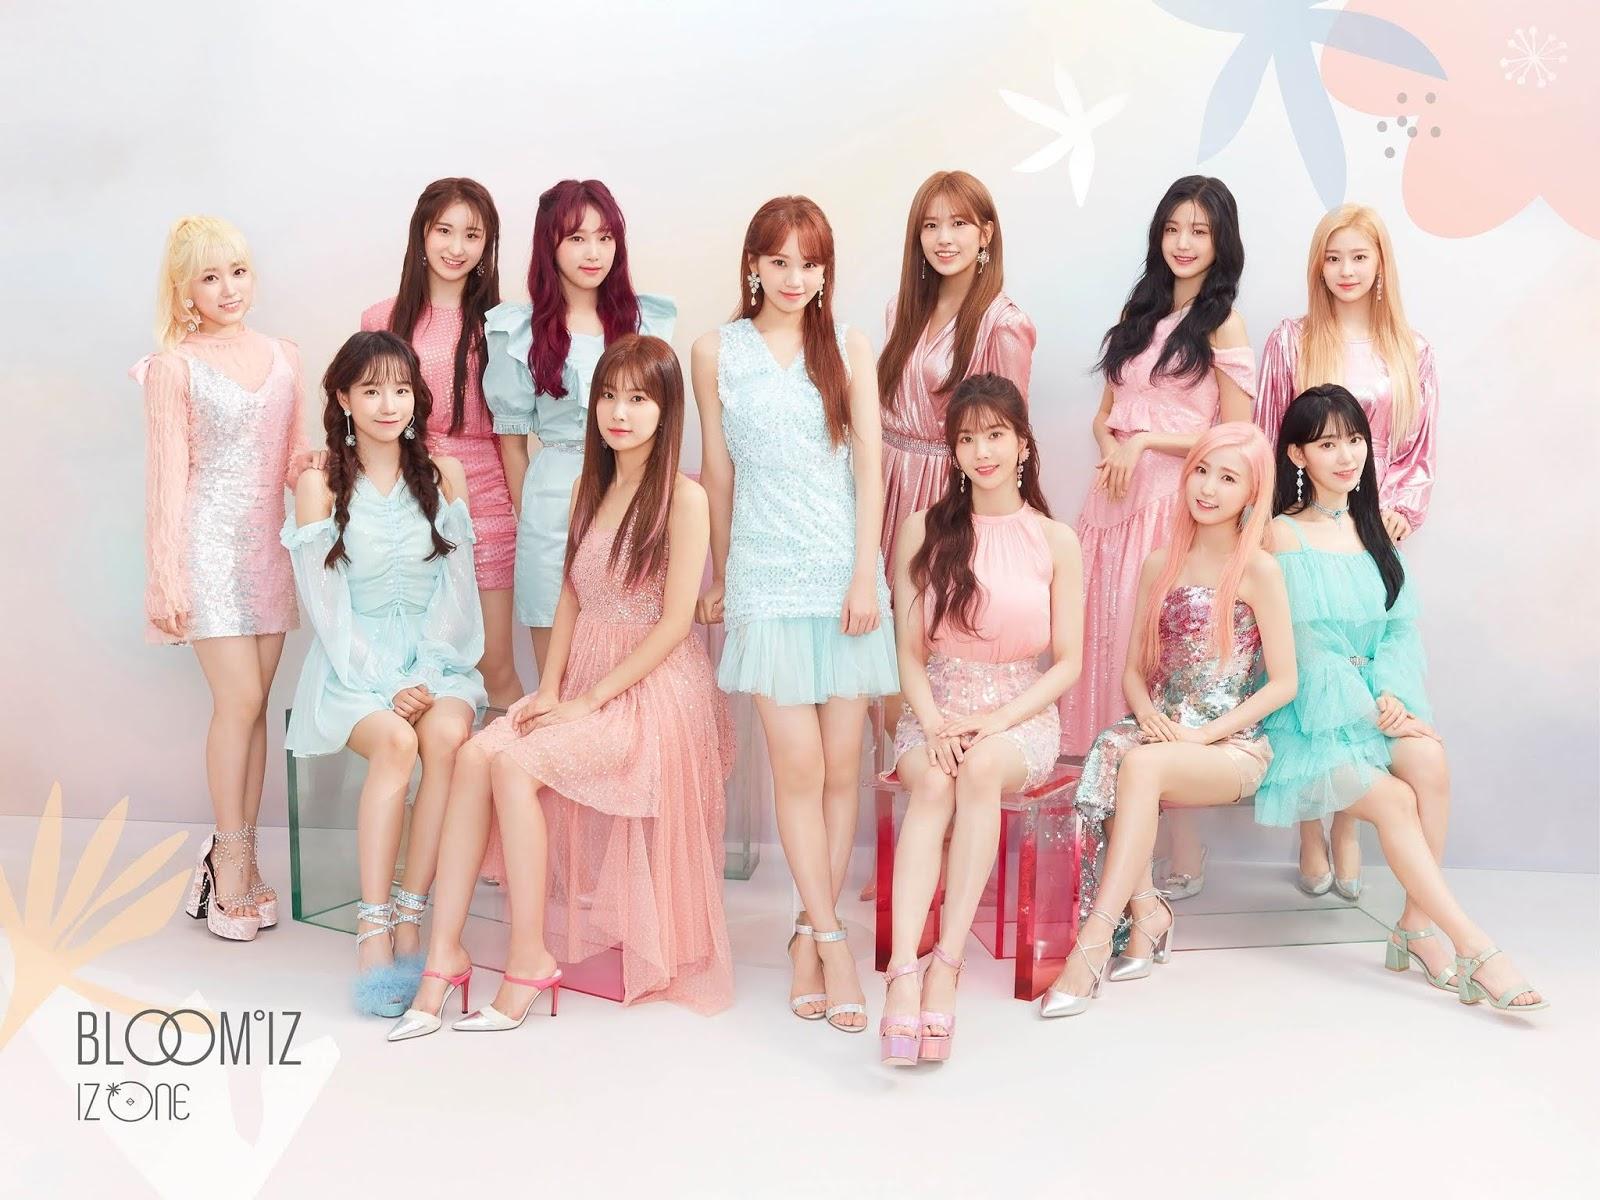 IZ*ONE Officially Cancels The Release of Album 'BLOOM*IZ'